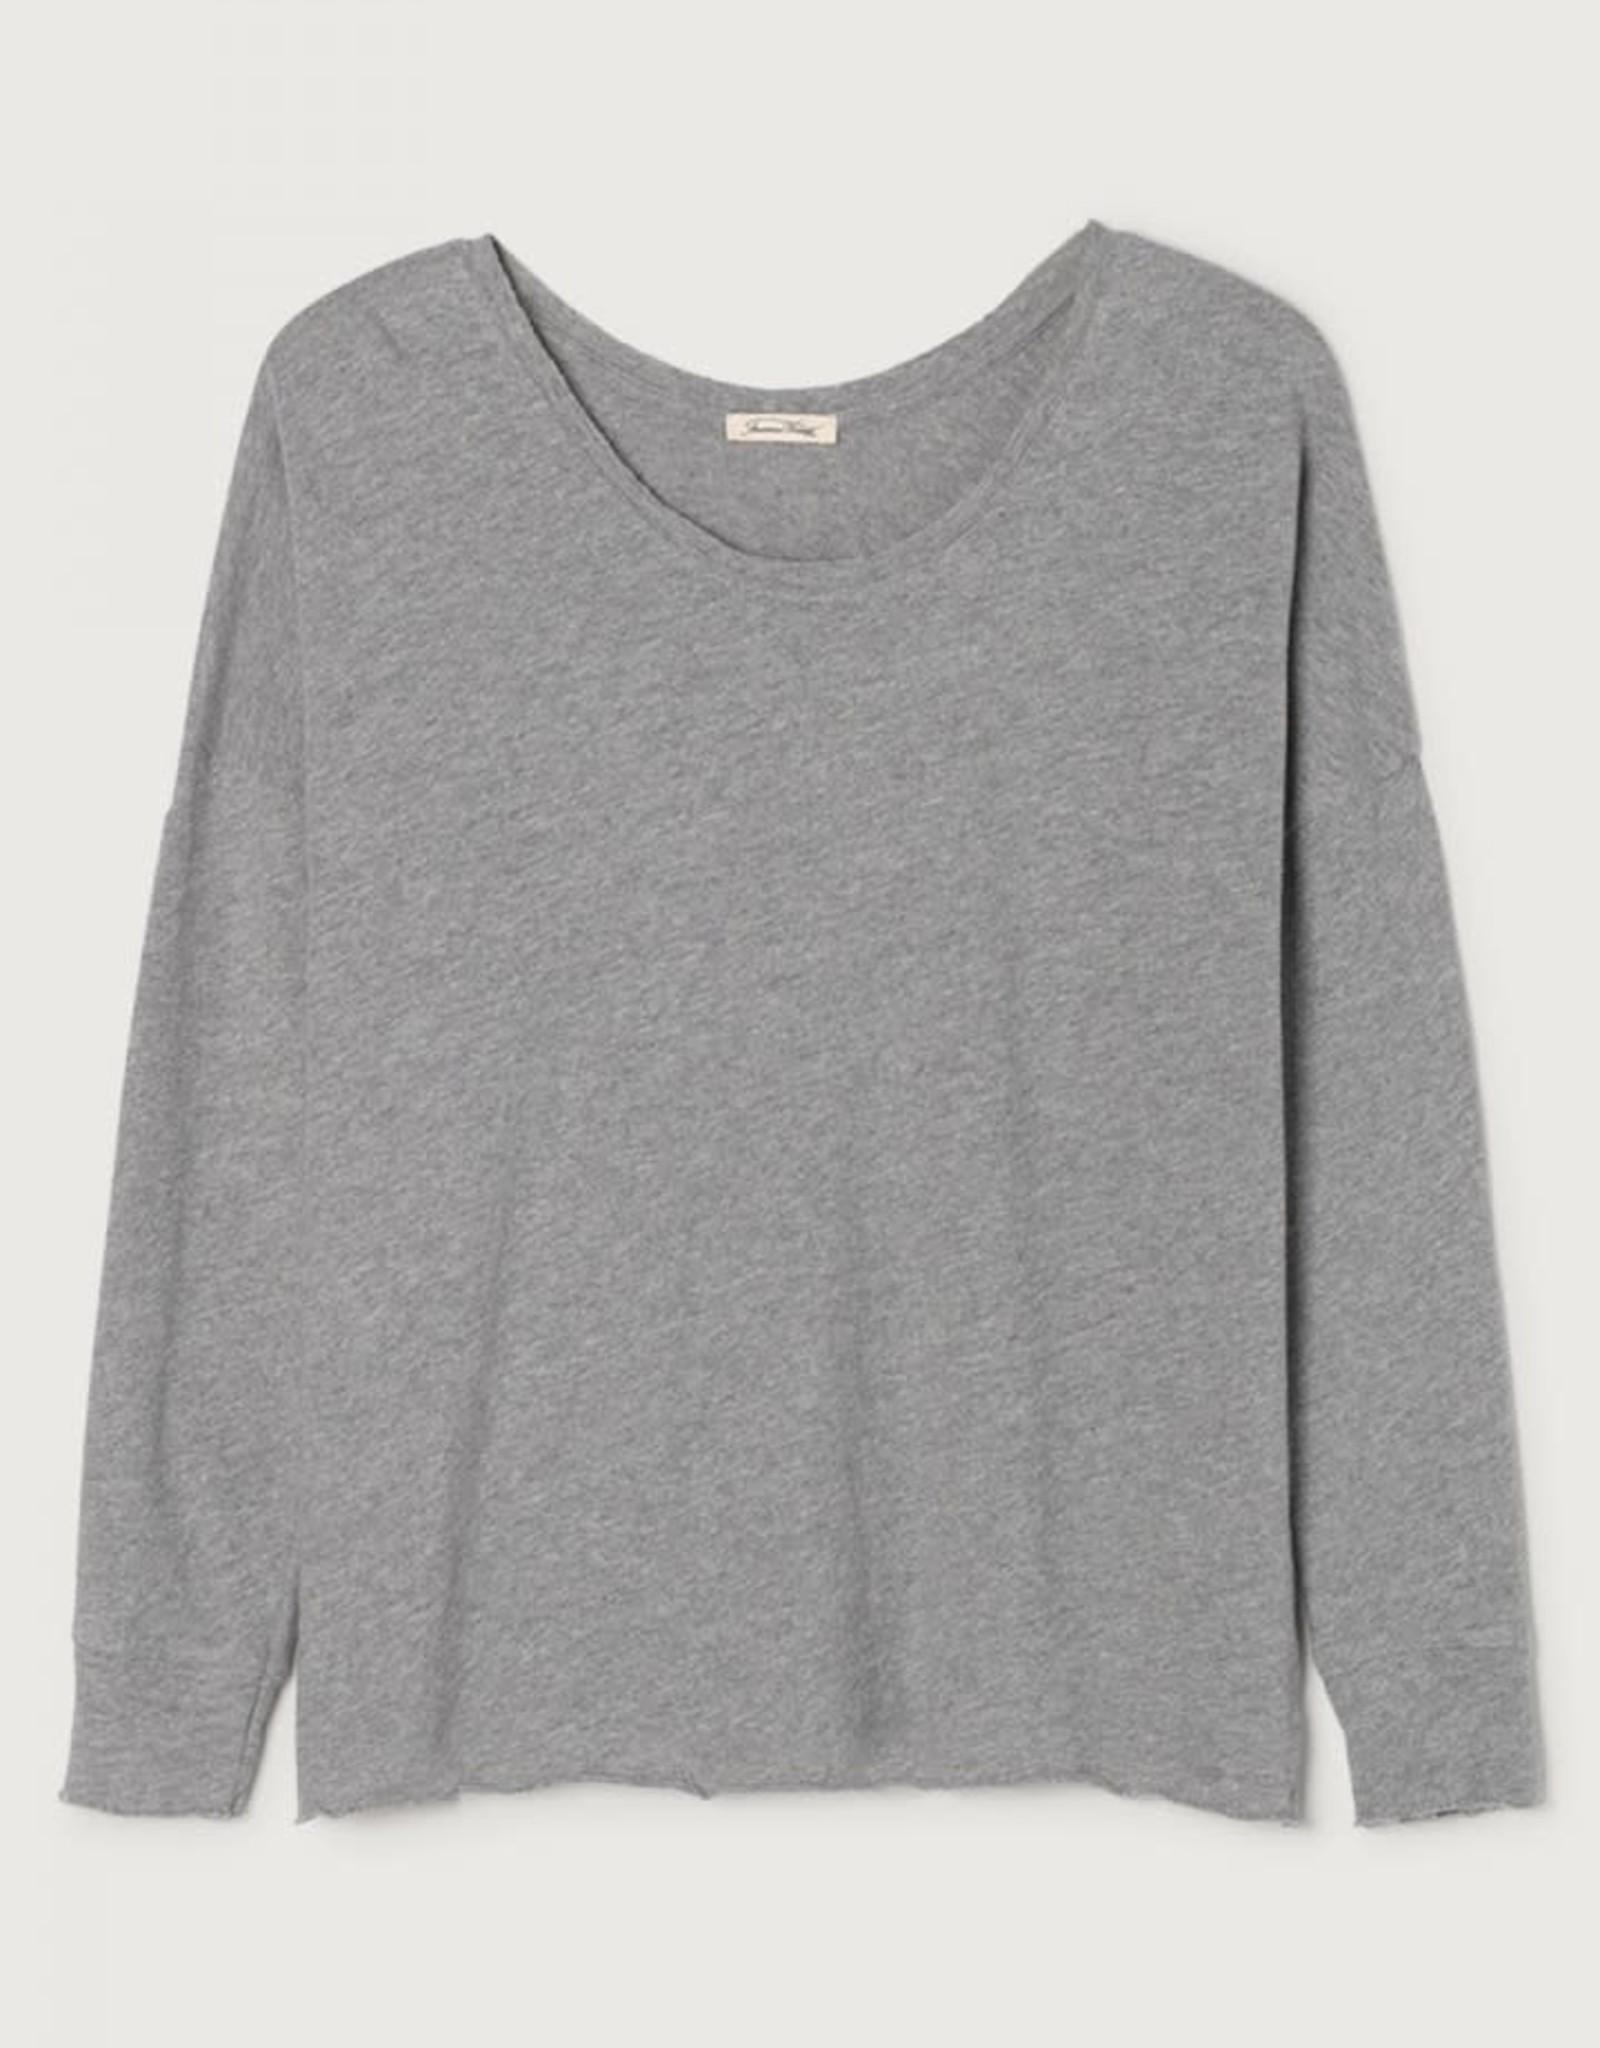 American Vintage T-shirt 'Sonoma' Recht Boothals - Grijs - American Vintage